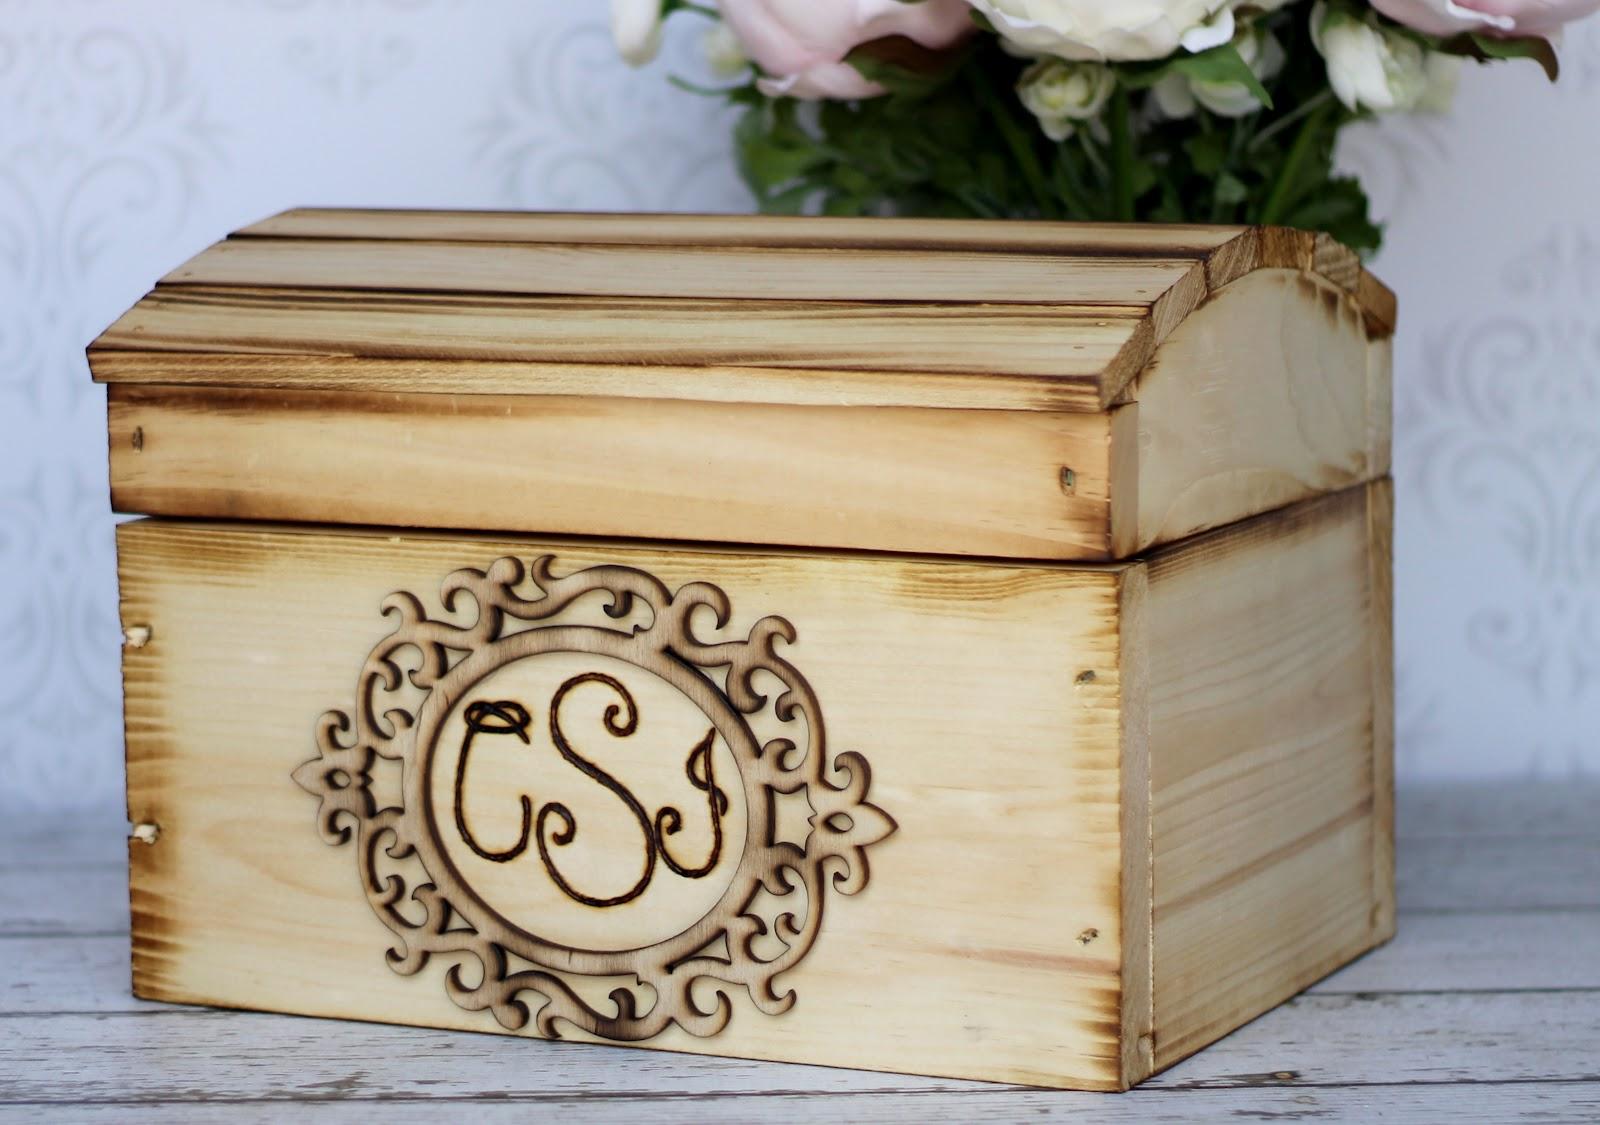 Rustic Wooden Card Box Rustic Wedding Decor Wedding Card |Wooden Chest For Wedding Cards